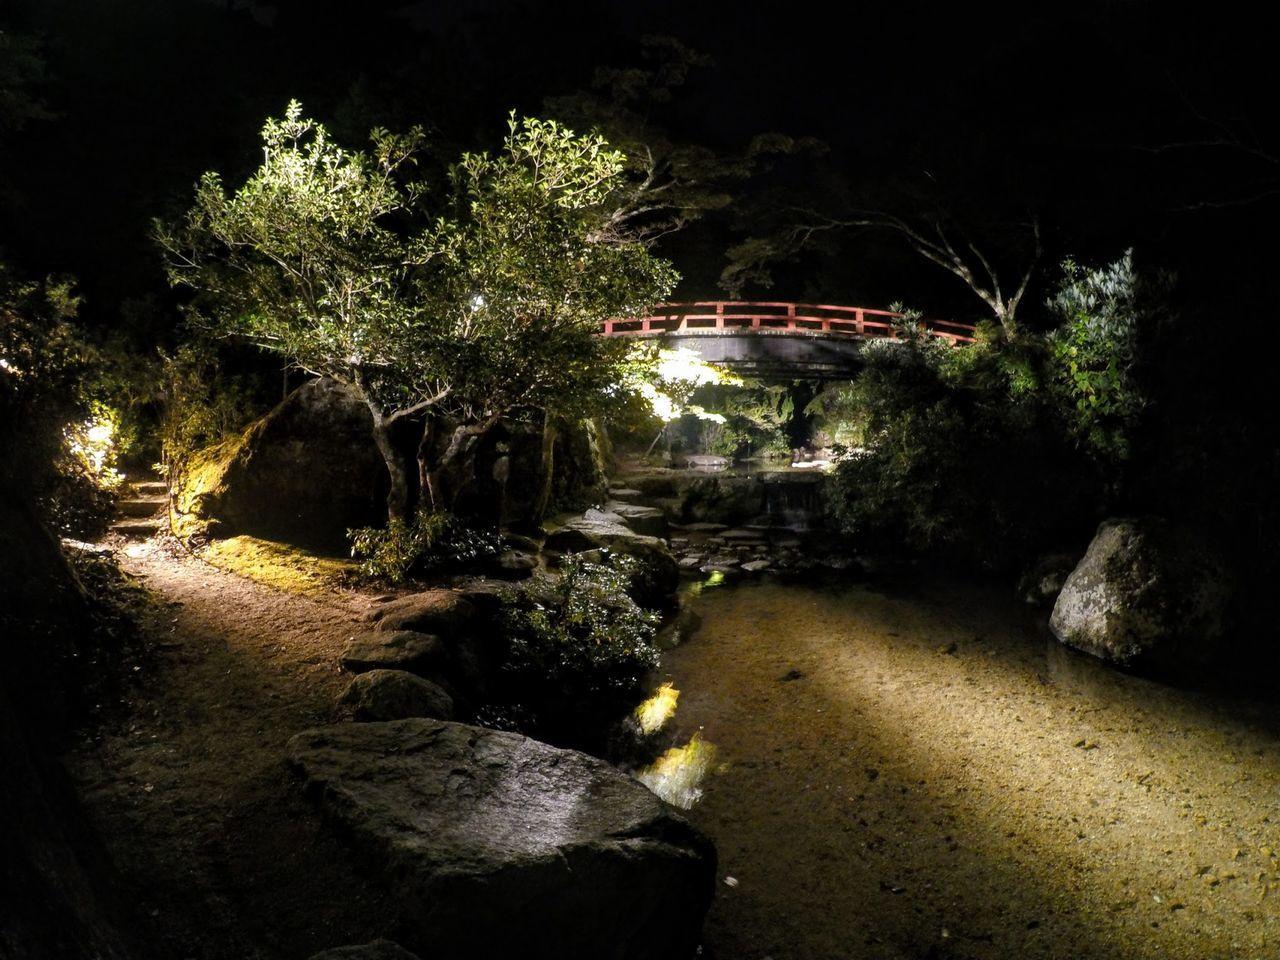 Atmospheric Scene Beauty In Nature Hiroshima,japan Illuminated Trees Miyajima Island Nature Night No People Outdoors Plants Red Bridge Rocks Traditional Japanese Garden Tranquil Garden Tree